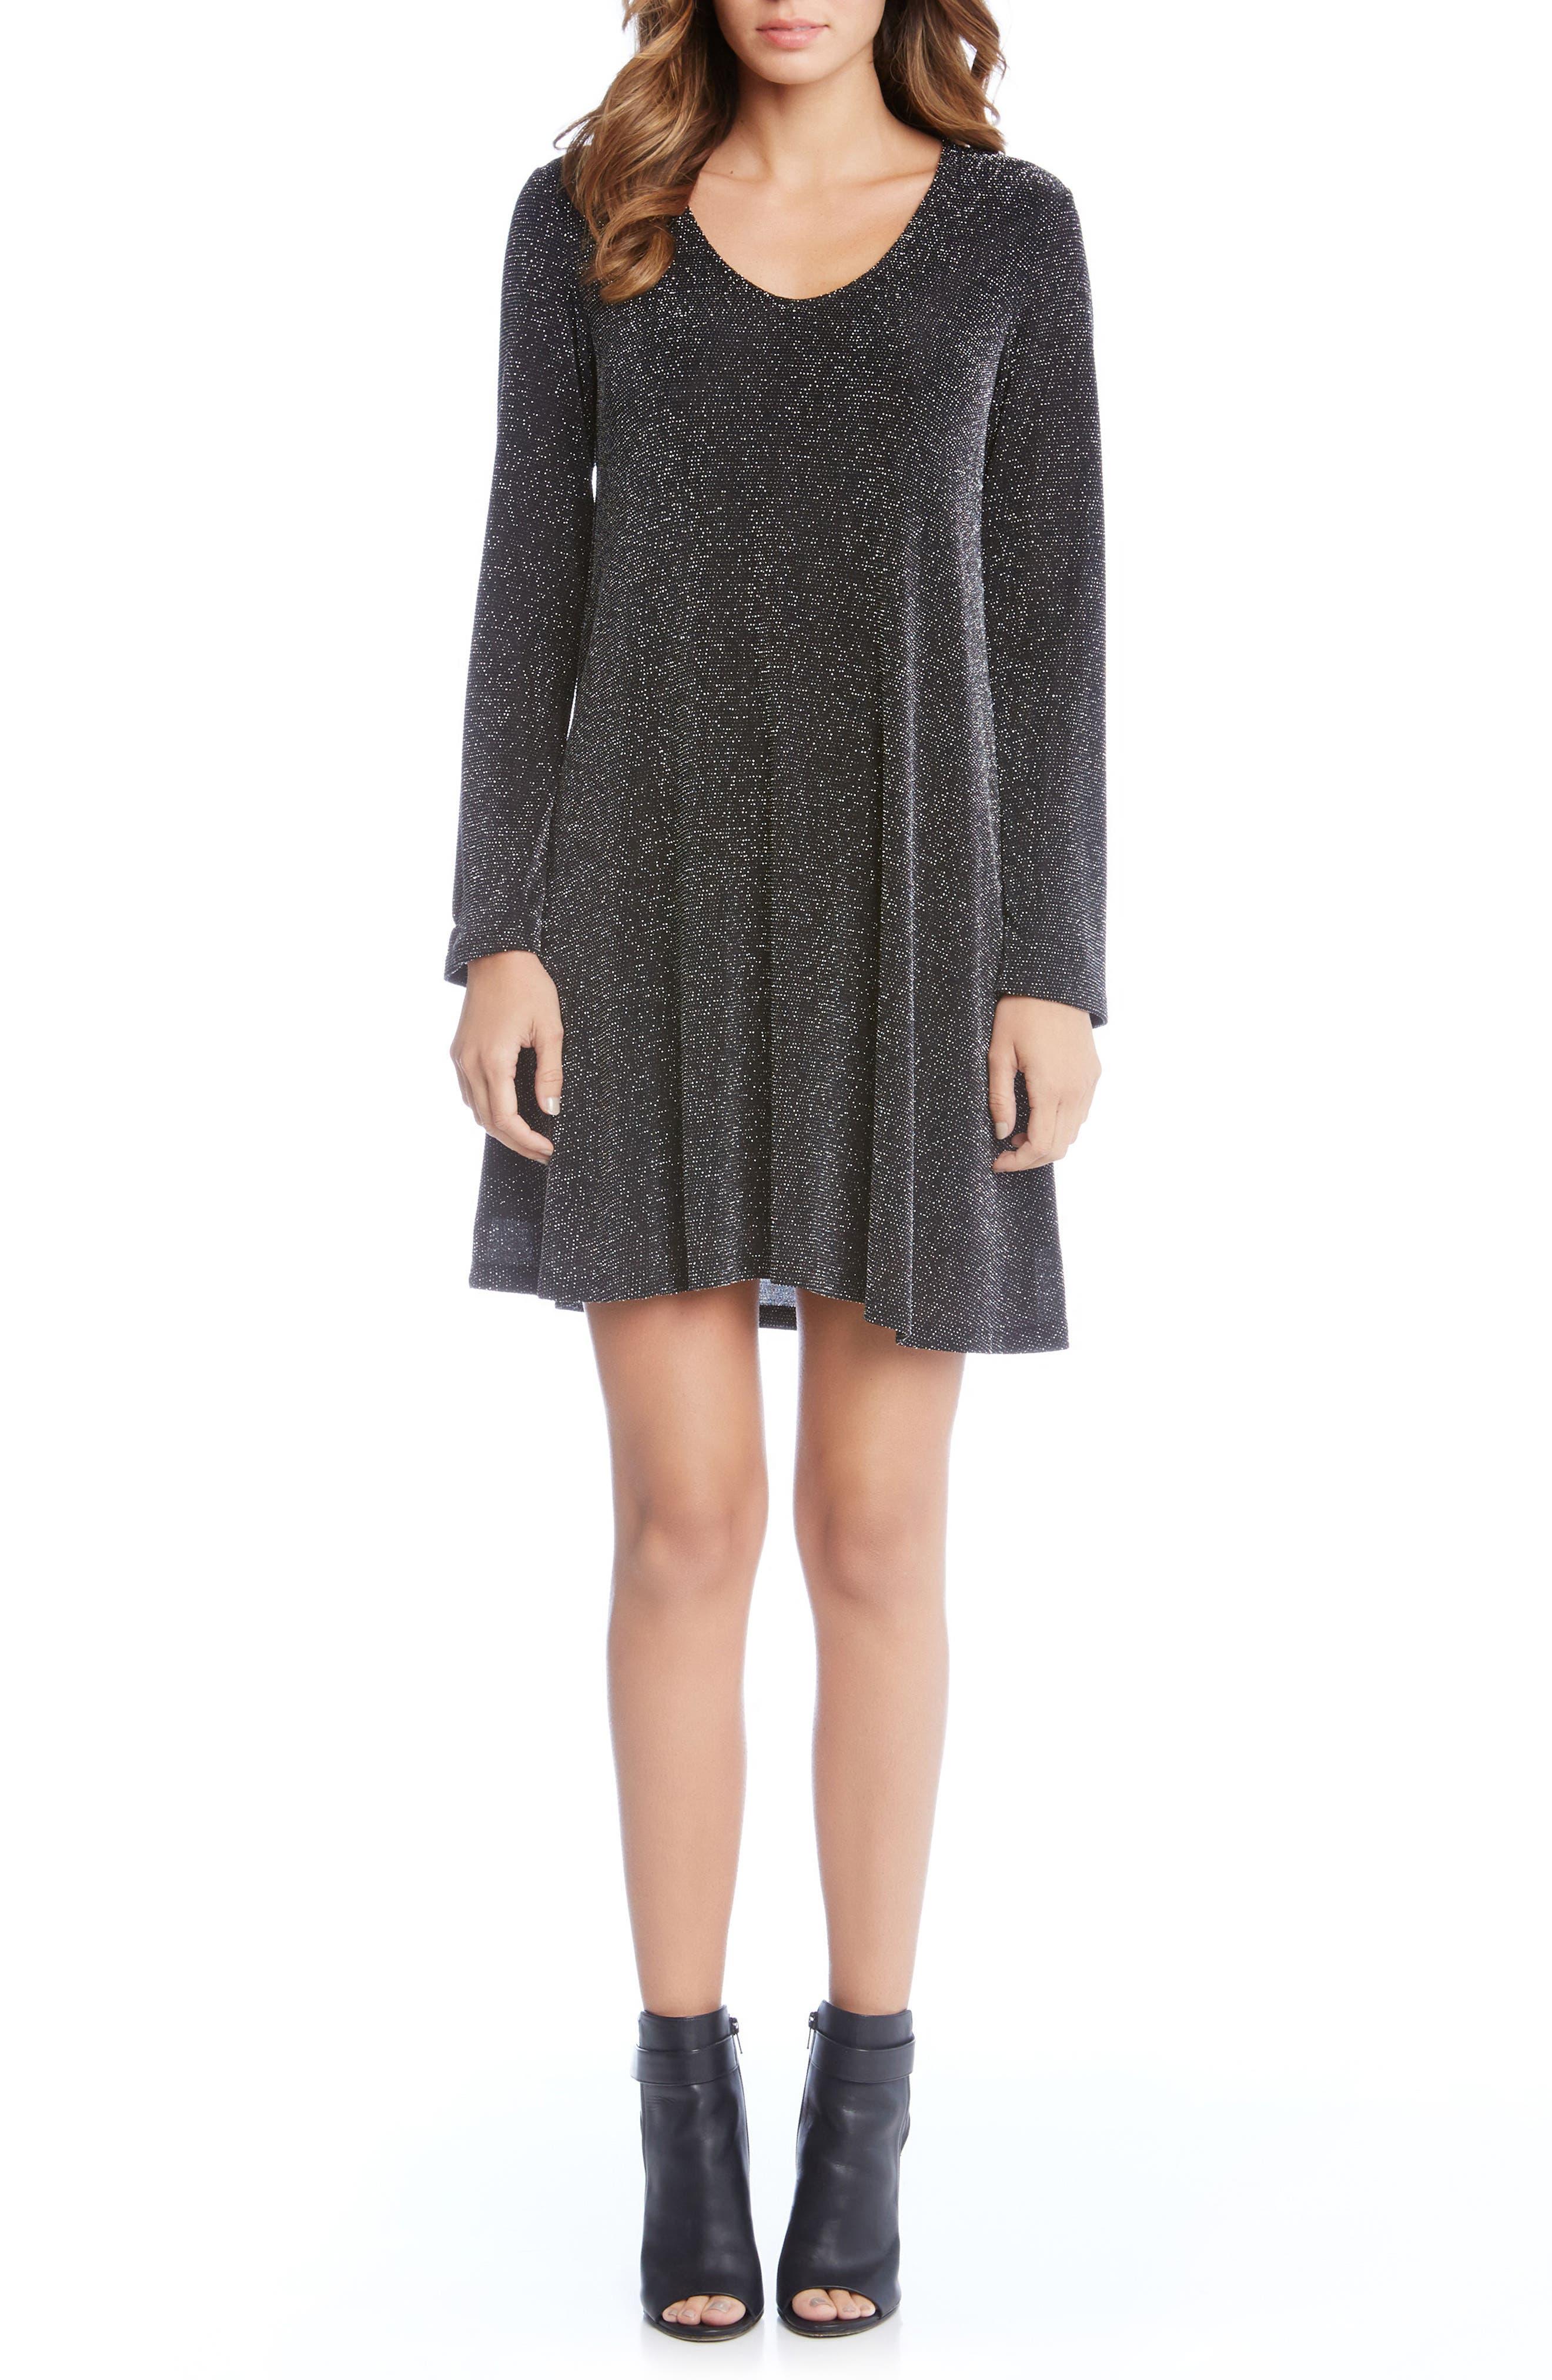 Alternate Image 1 Selected - Karen Kane Sparkle Knit Shift Dress